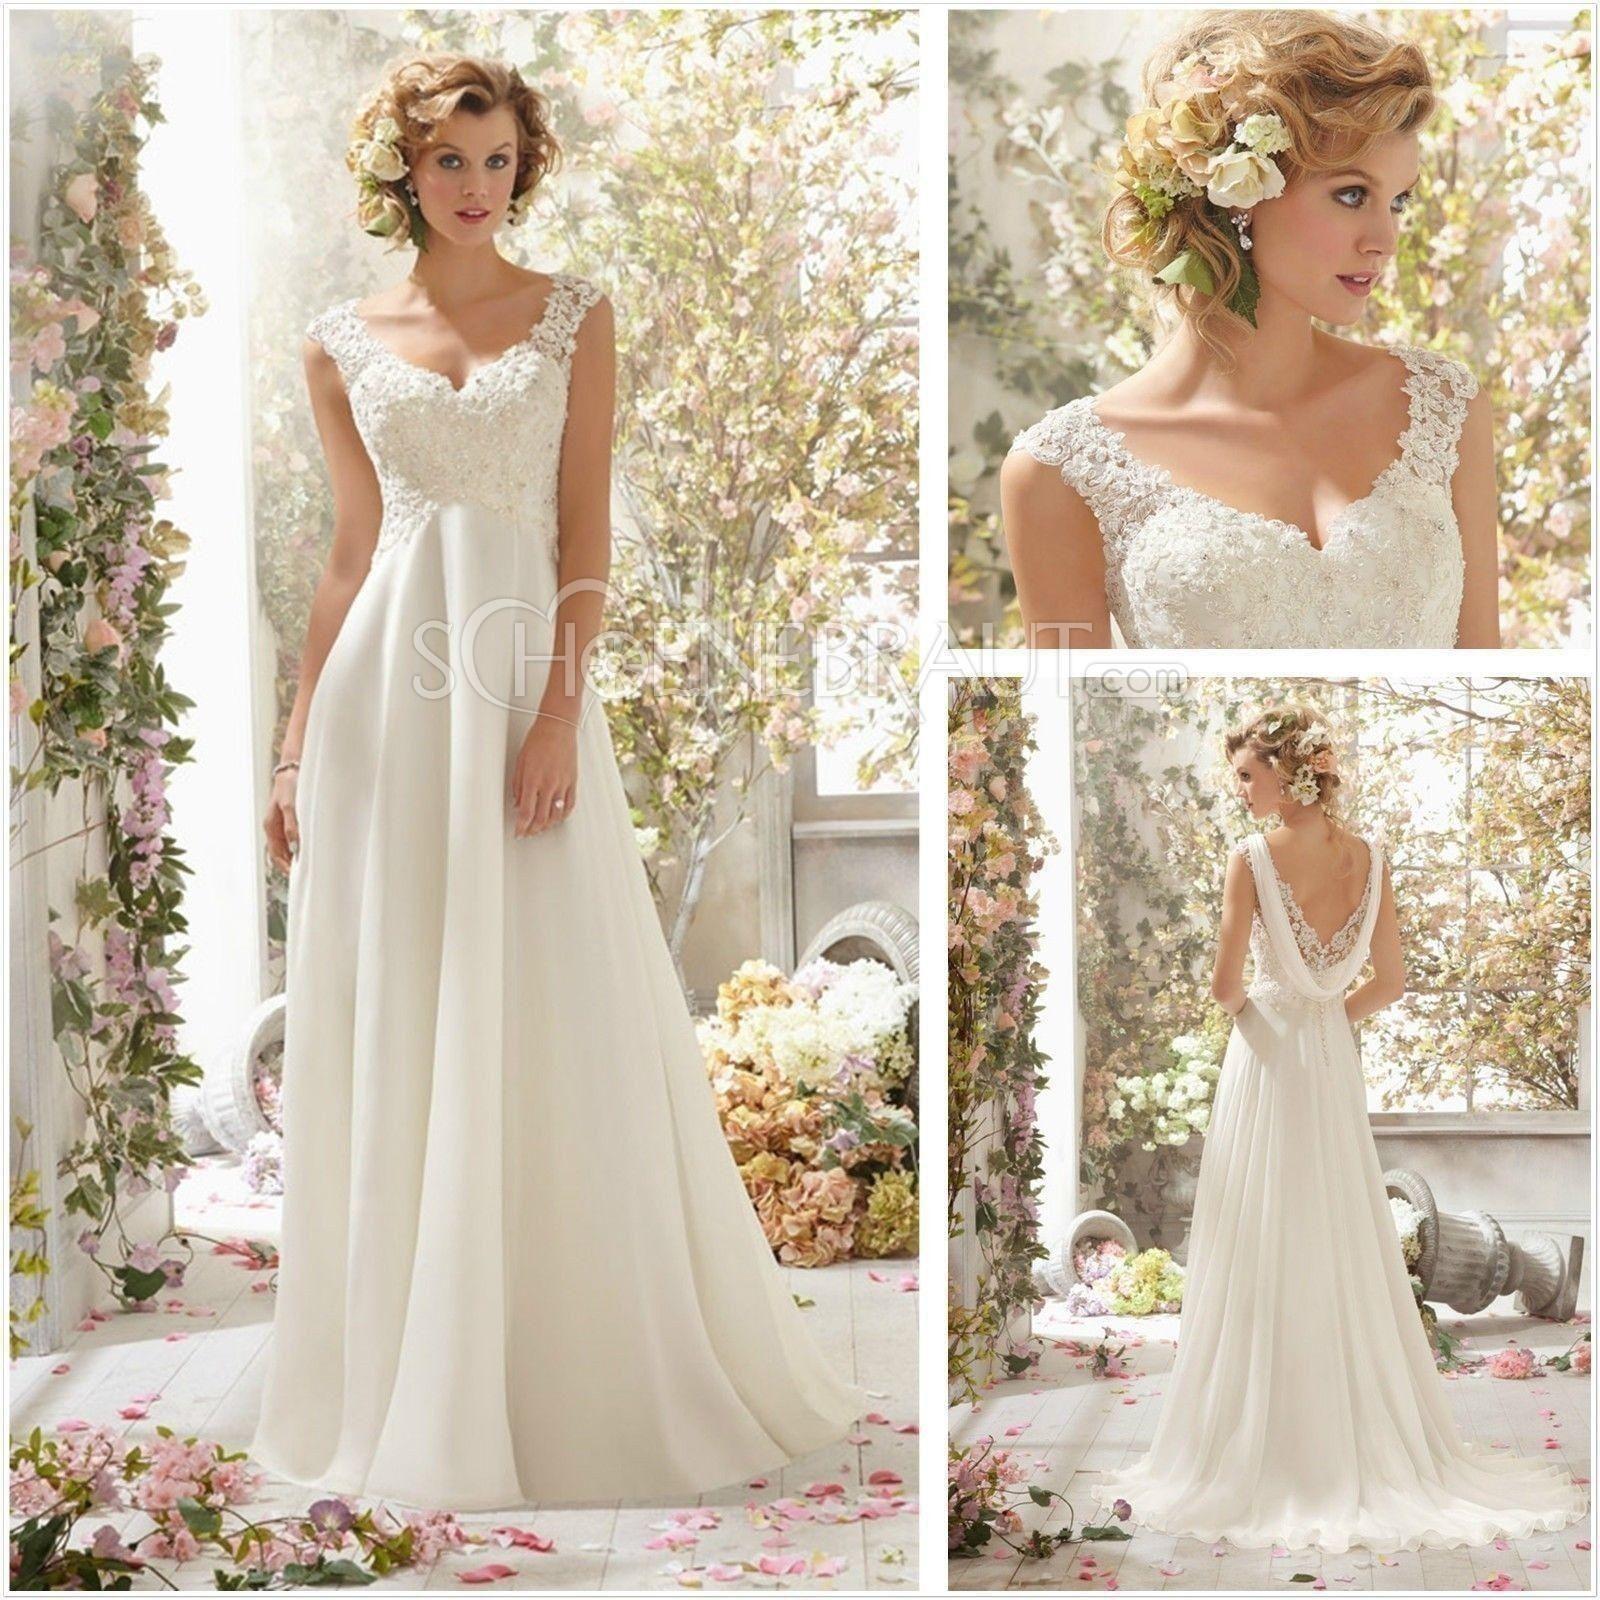 Kleid Standesamt Brautkleid Standesamt Spitze Lang mit Umhang